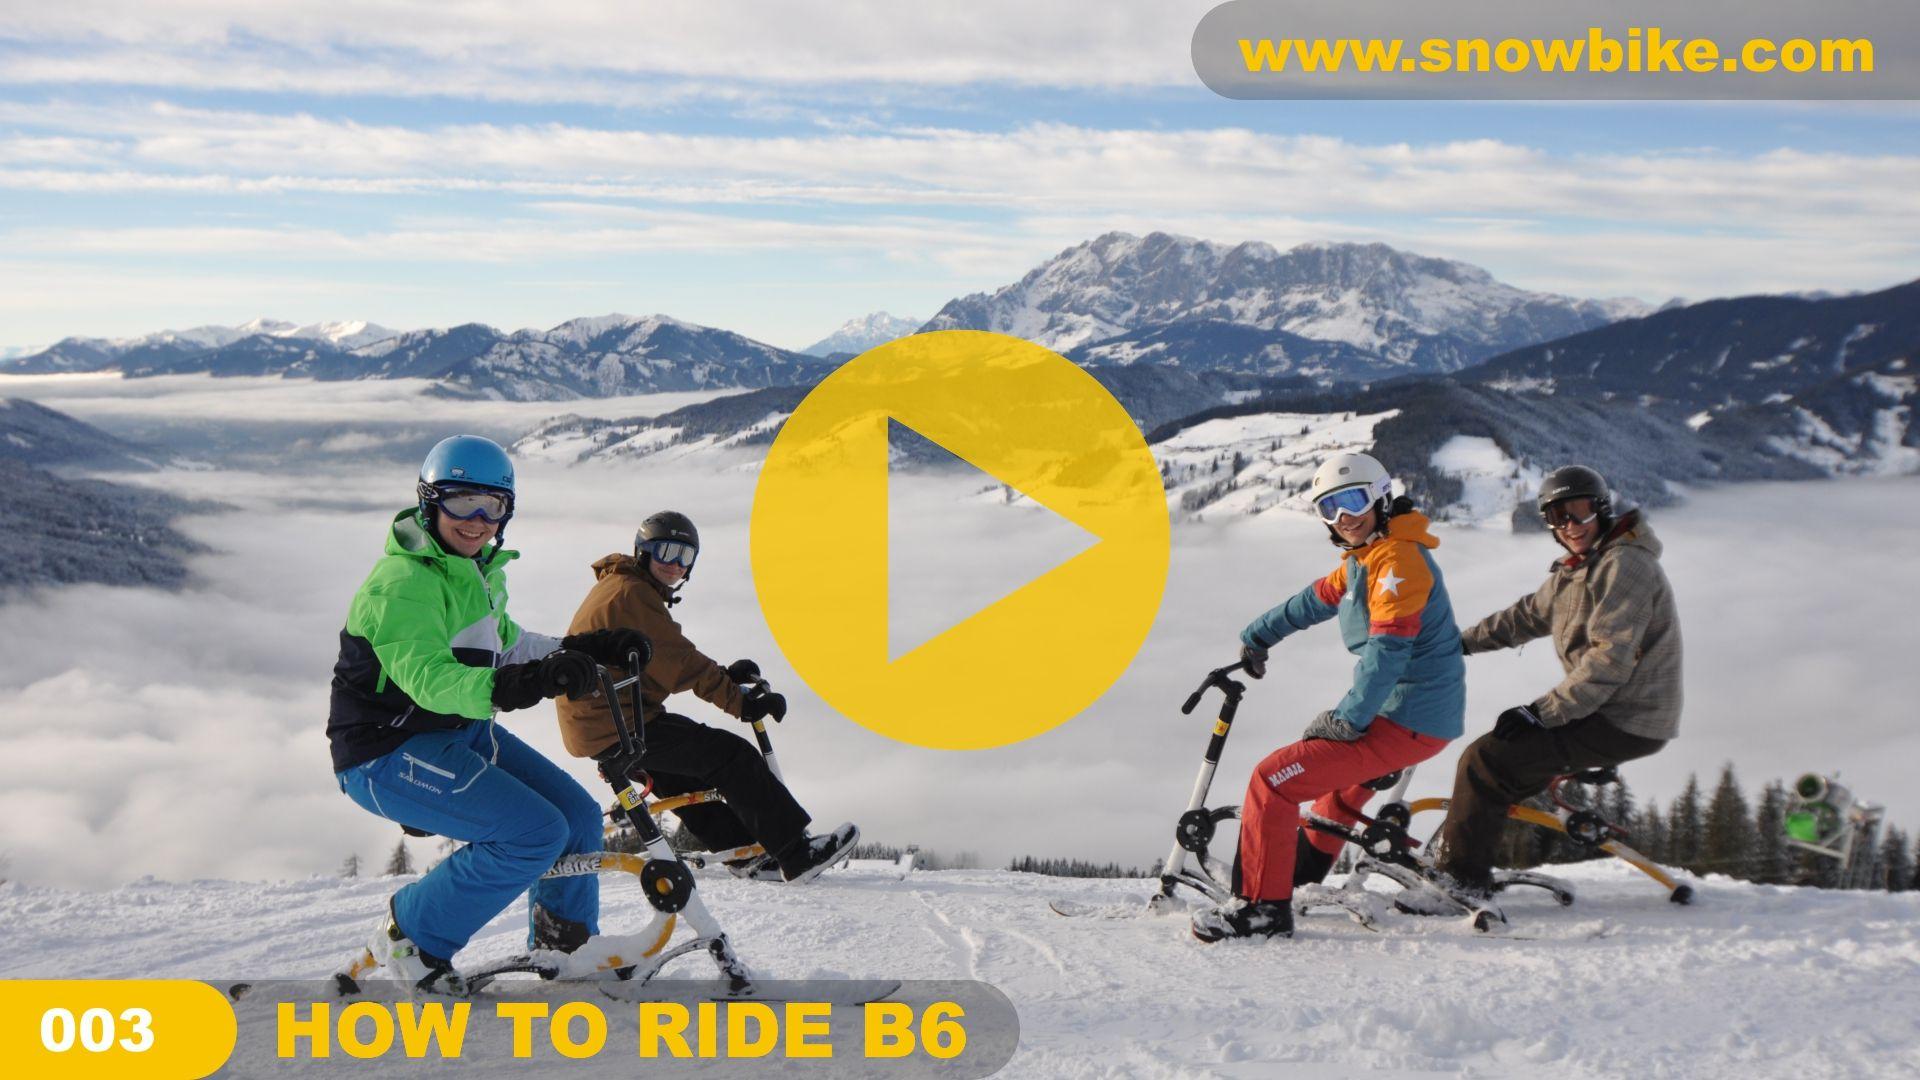 snowbike-basics-how-to-ride-b6-cover8808639C-40E0-9BB3-F59E-449B4D8F486E.jpg